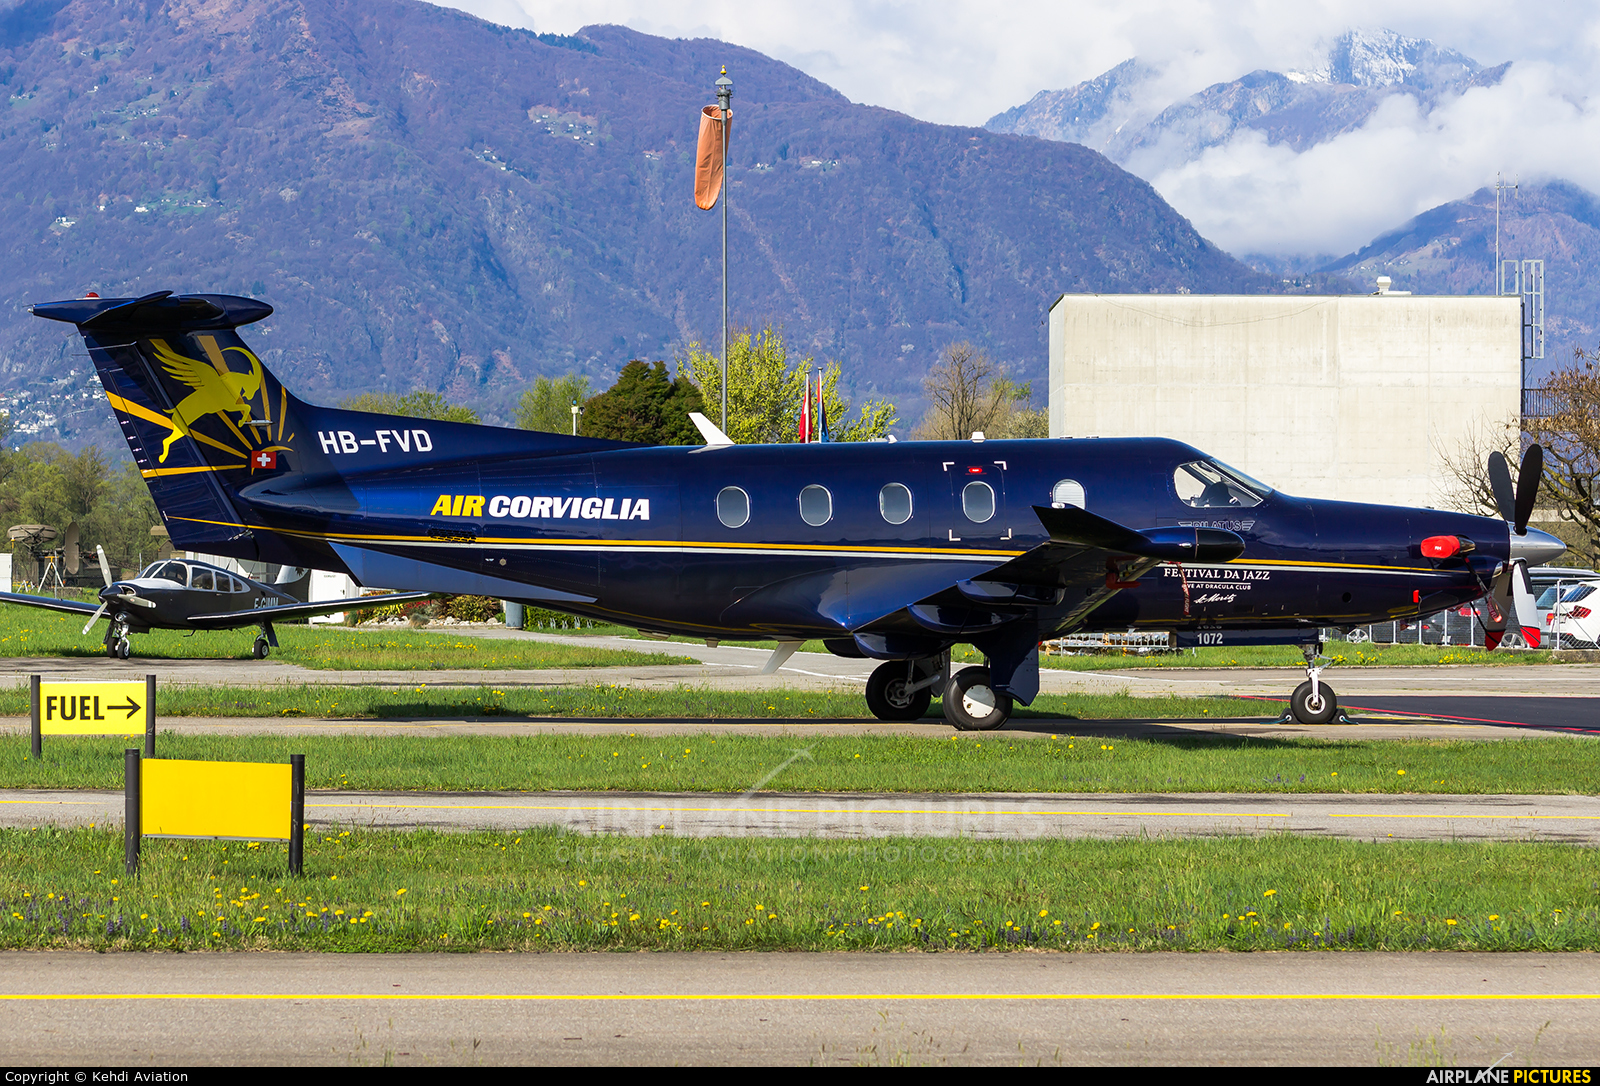 Air Corviglia HB-FVD aircraft at Locarno